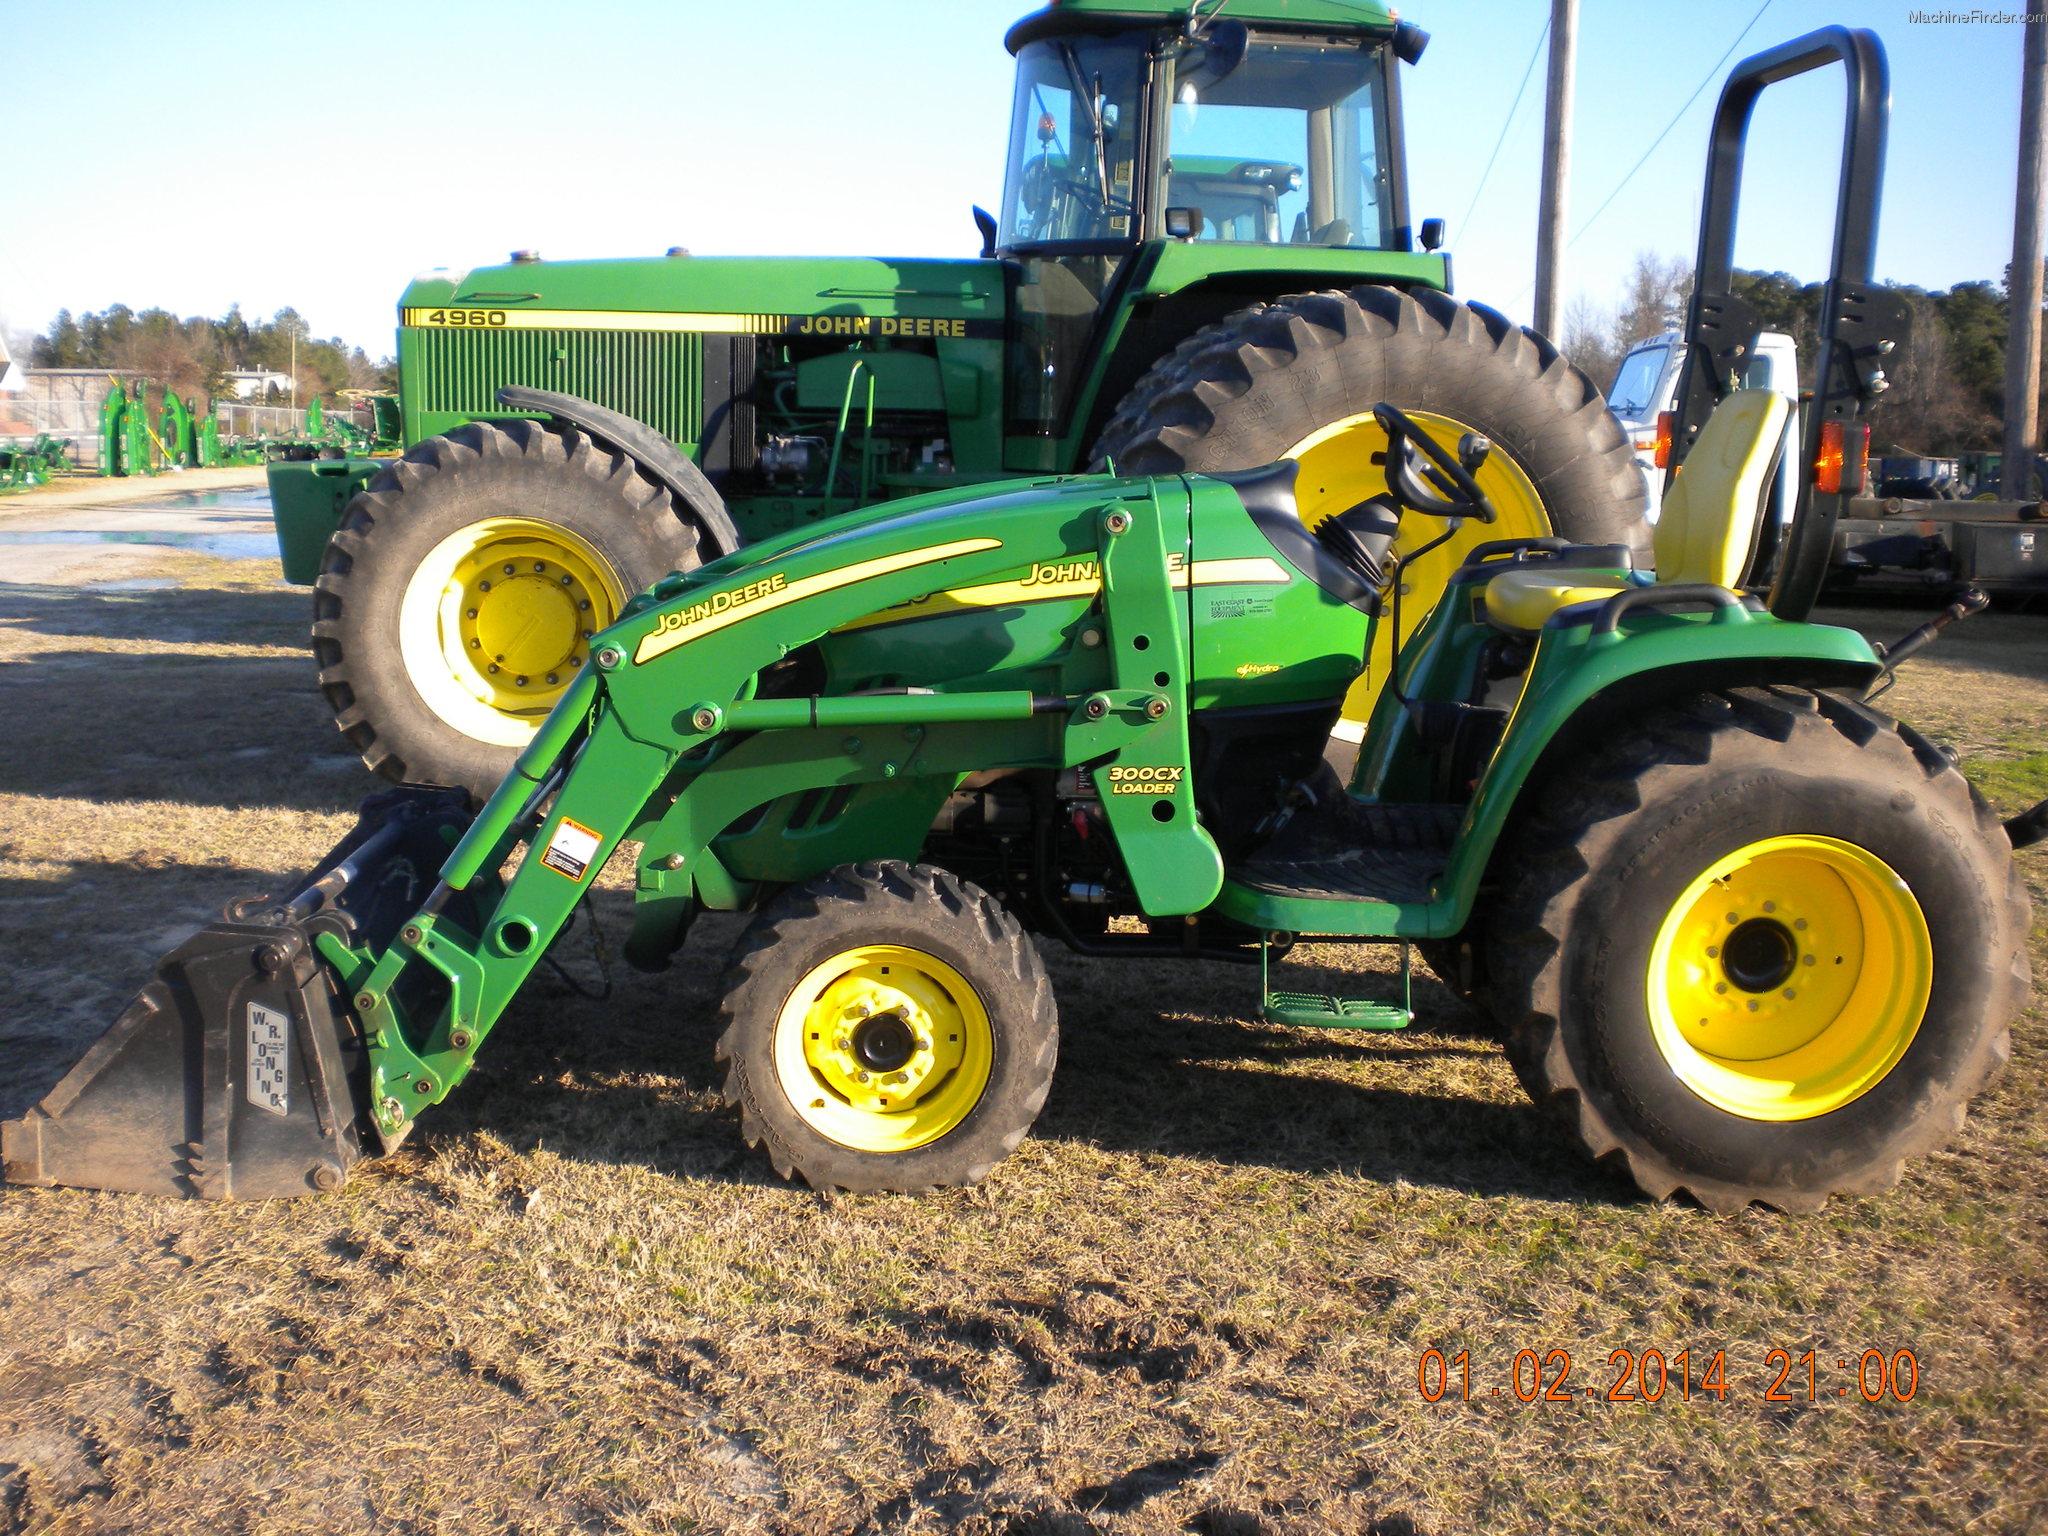 2006 John Deere 3120 Tractors - Compact (1-40hp.) - John ...